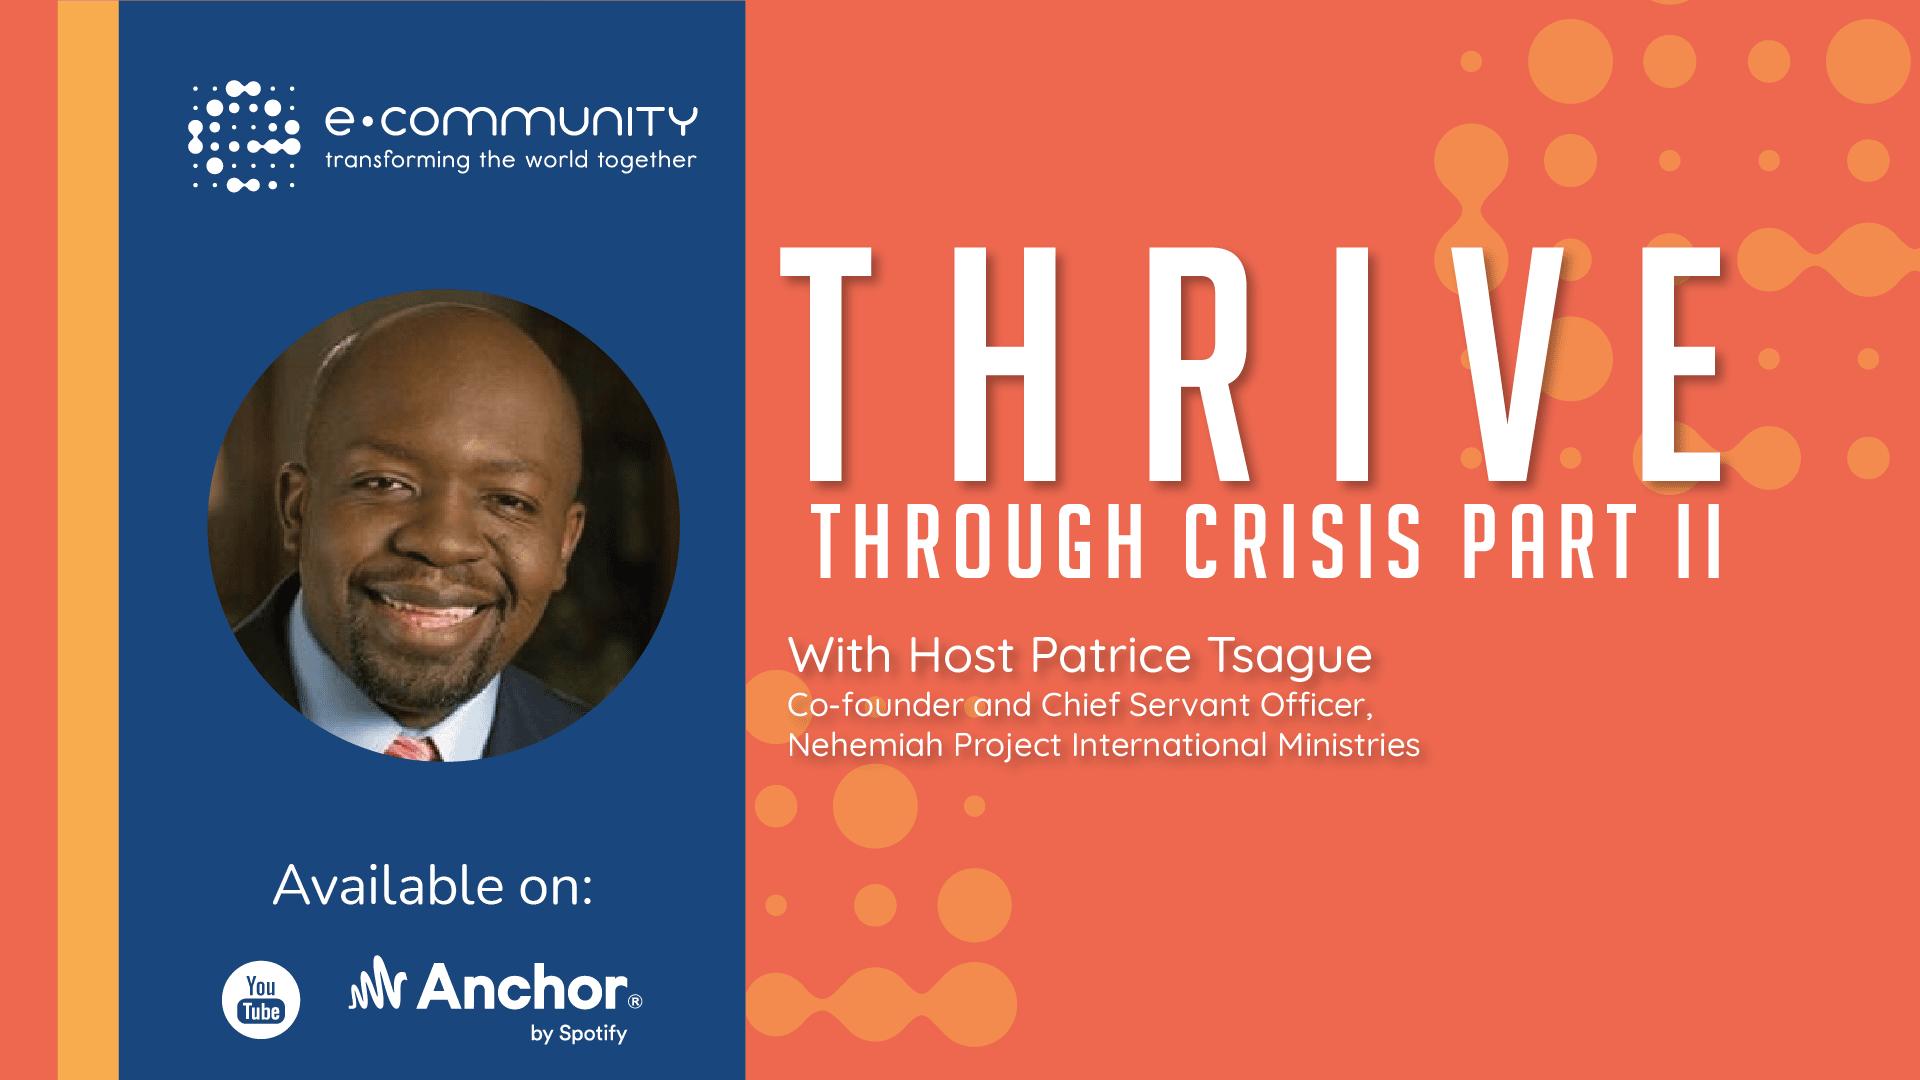 THRIVE Through Crisis Part II